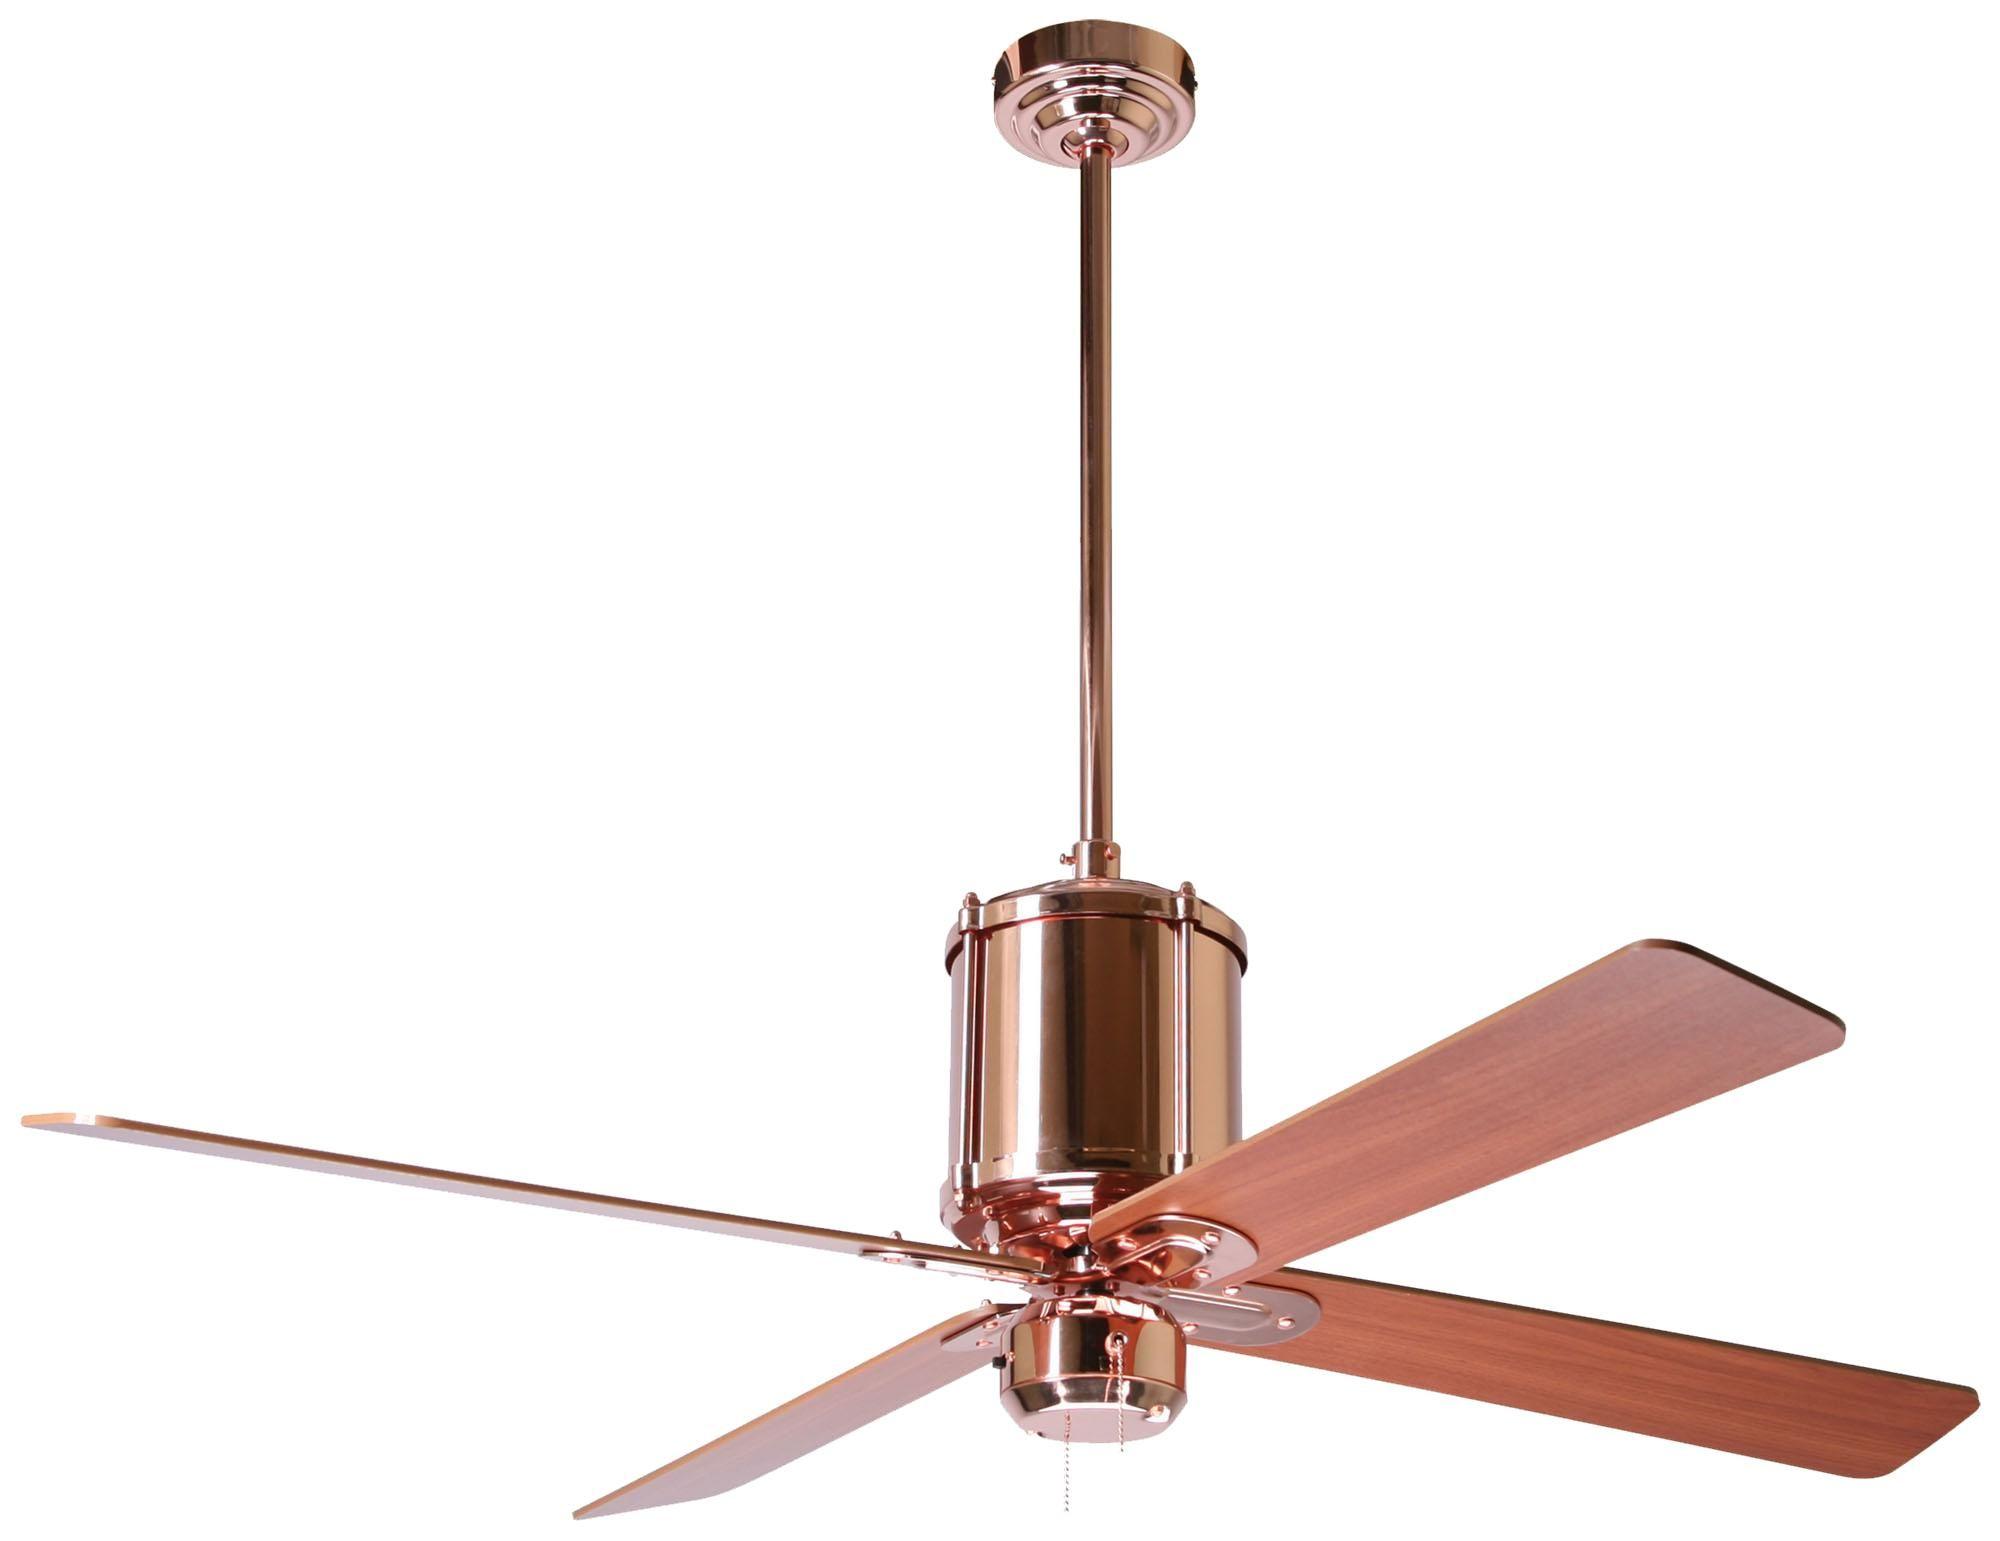 light inspiring plan wdays ceilings ideas lights fans design rustic architecture info mount regarding fan flush with amazing ceiling